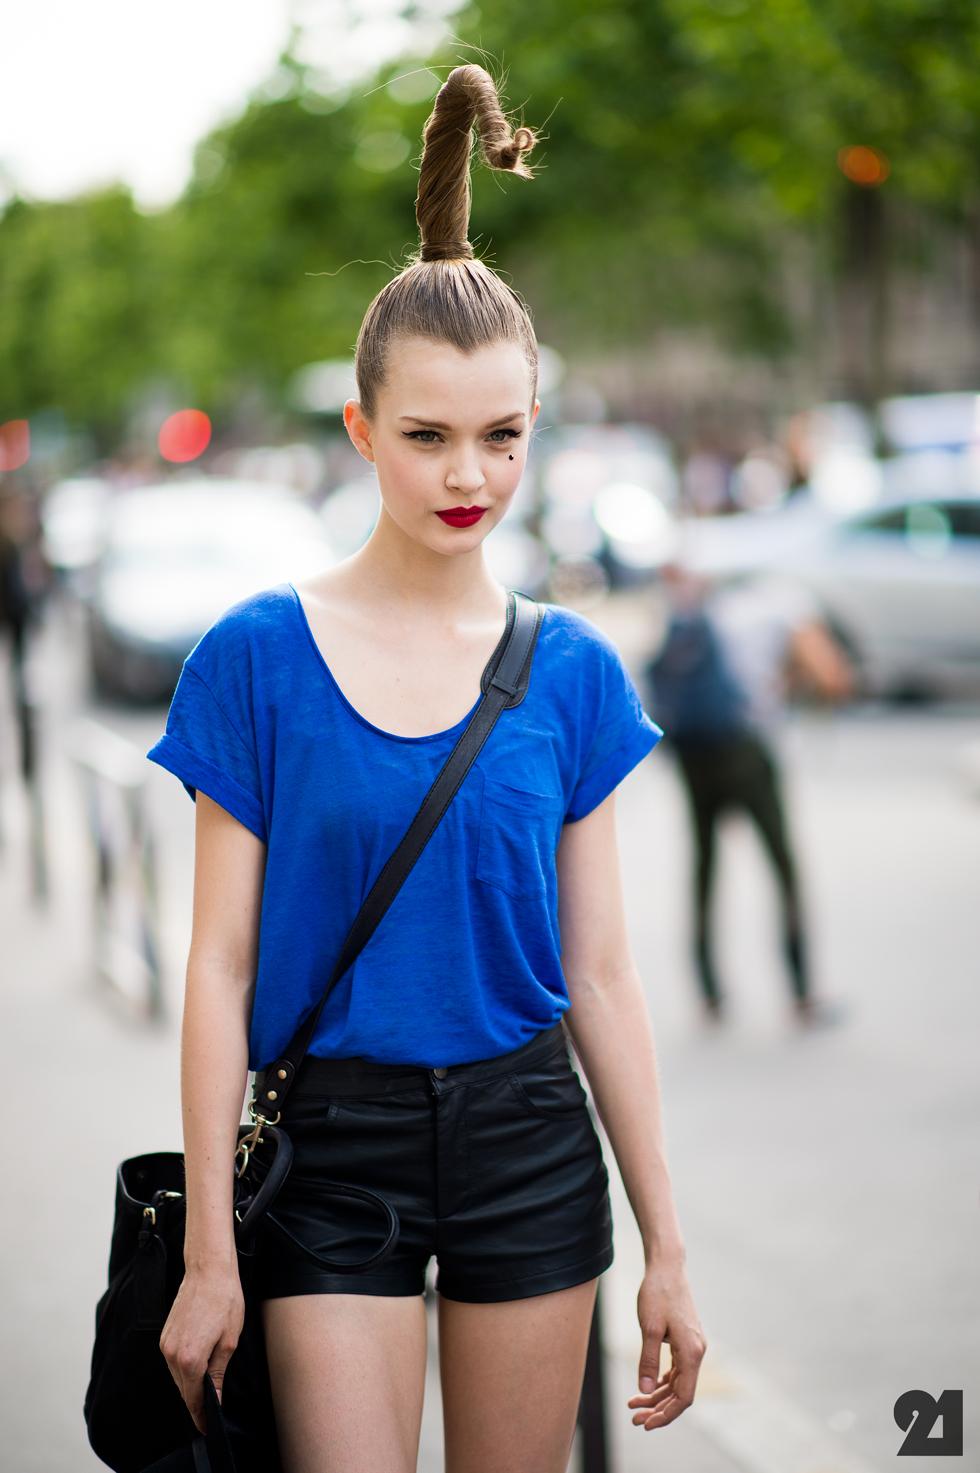 Le-21eme-Adam-Katz-Sinding-Josephine-Skriver-Paris-Haute-Couture-Fashion-Week-Fall-Winter-2012-2013-New-York-City-Street-Style-Blog_D4A2293